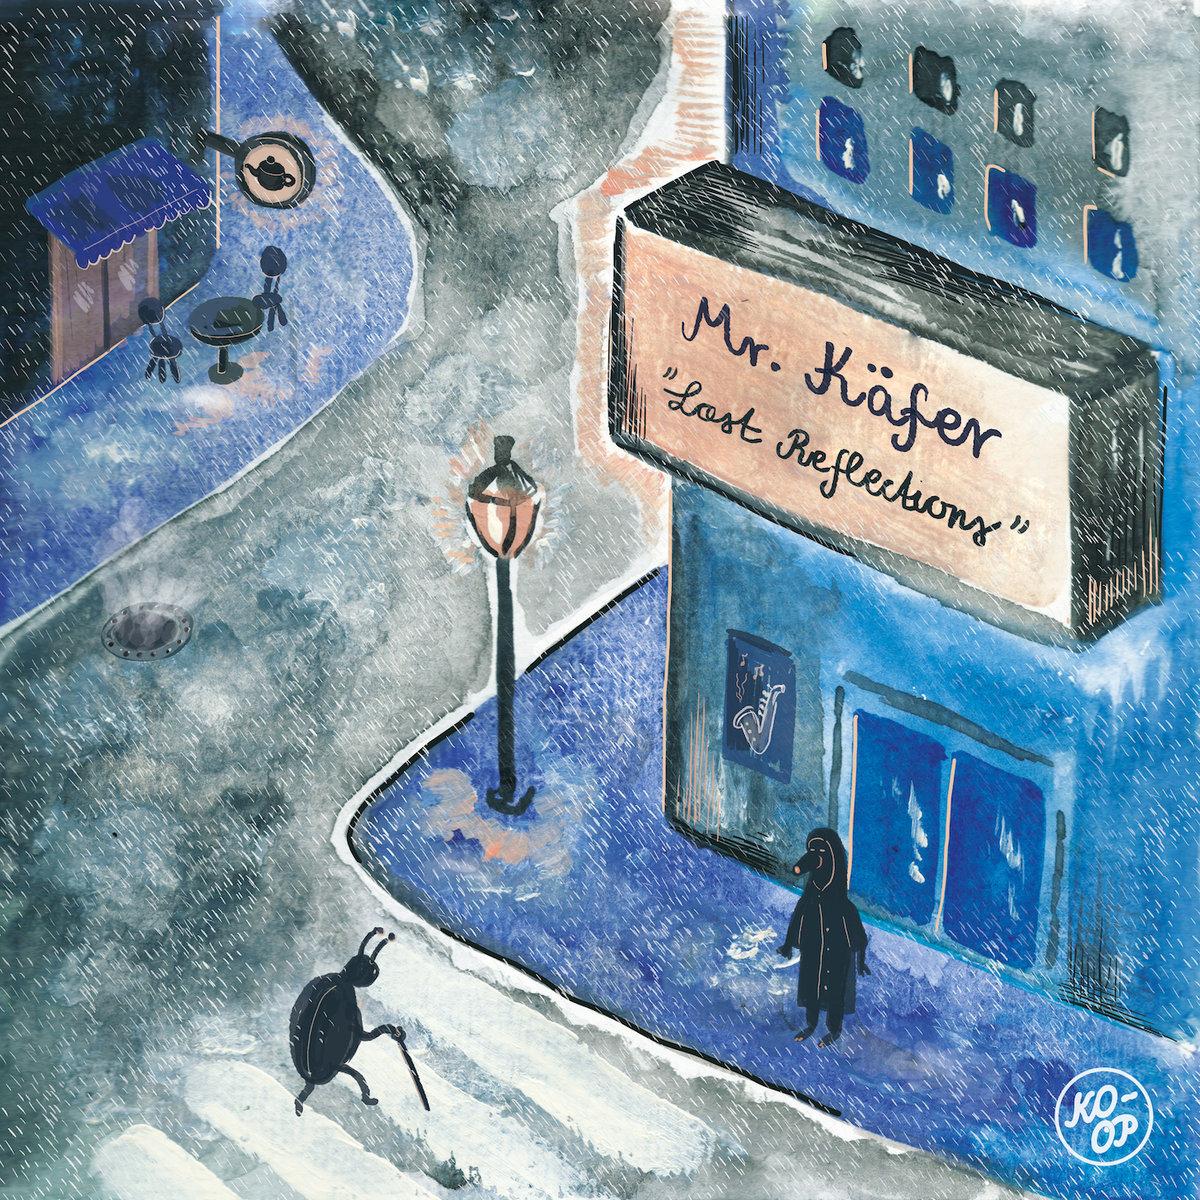 Mr-Kafer-Lost-Reflections-KO-OP